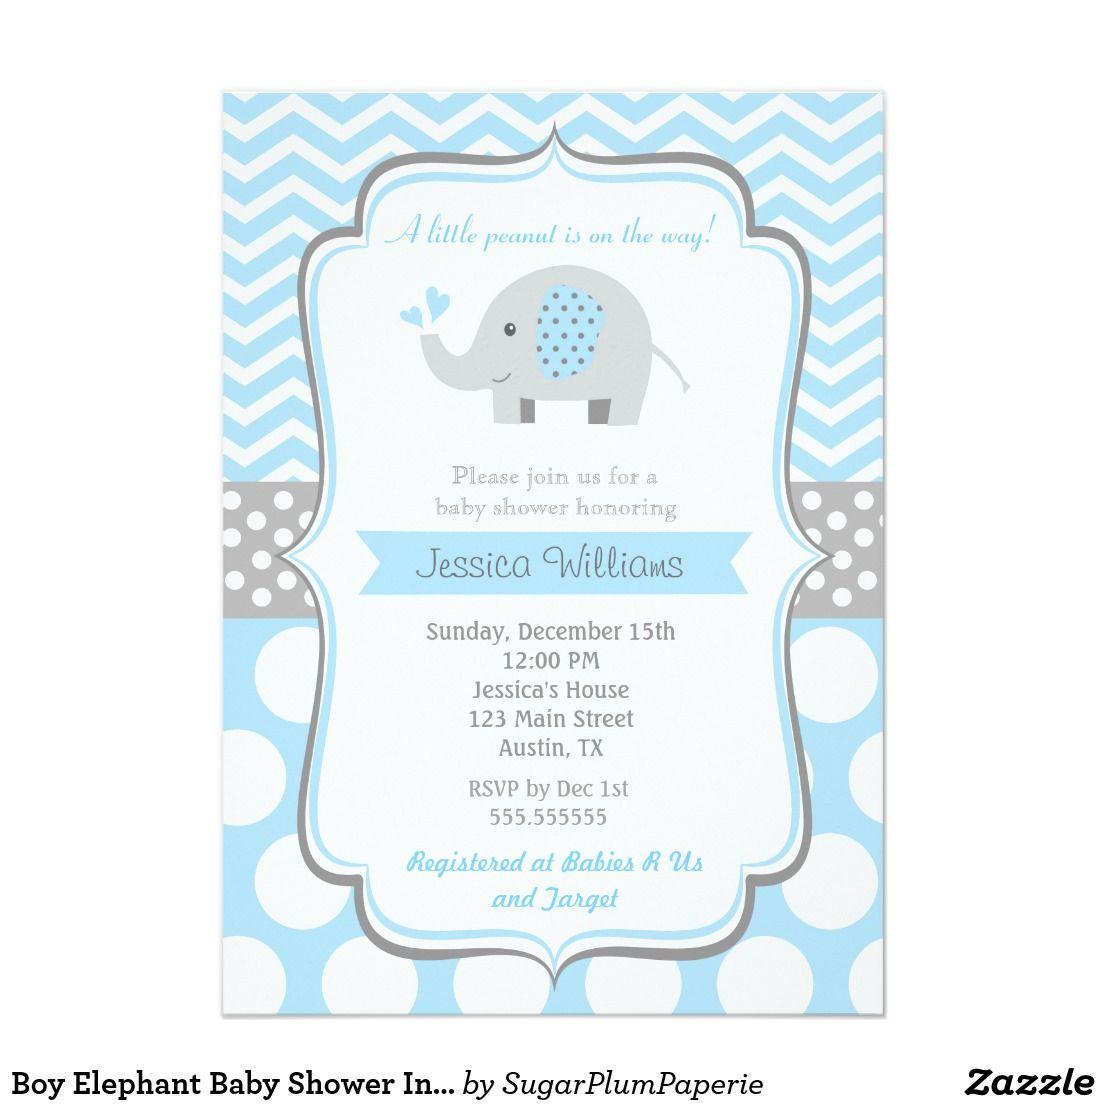 Boy elephant baby shower invitations elephant baby boy theme baby baby shower boy elephant blue gray chevron polka dot adorable personalized baby shower invite announcement invitations card elephant baby invitations filmwisefo